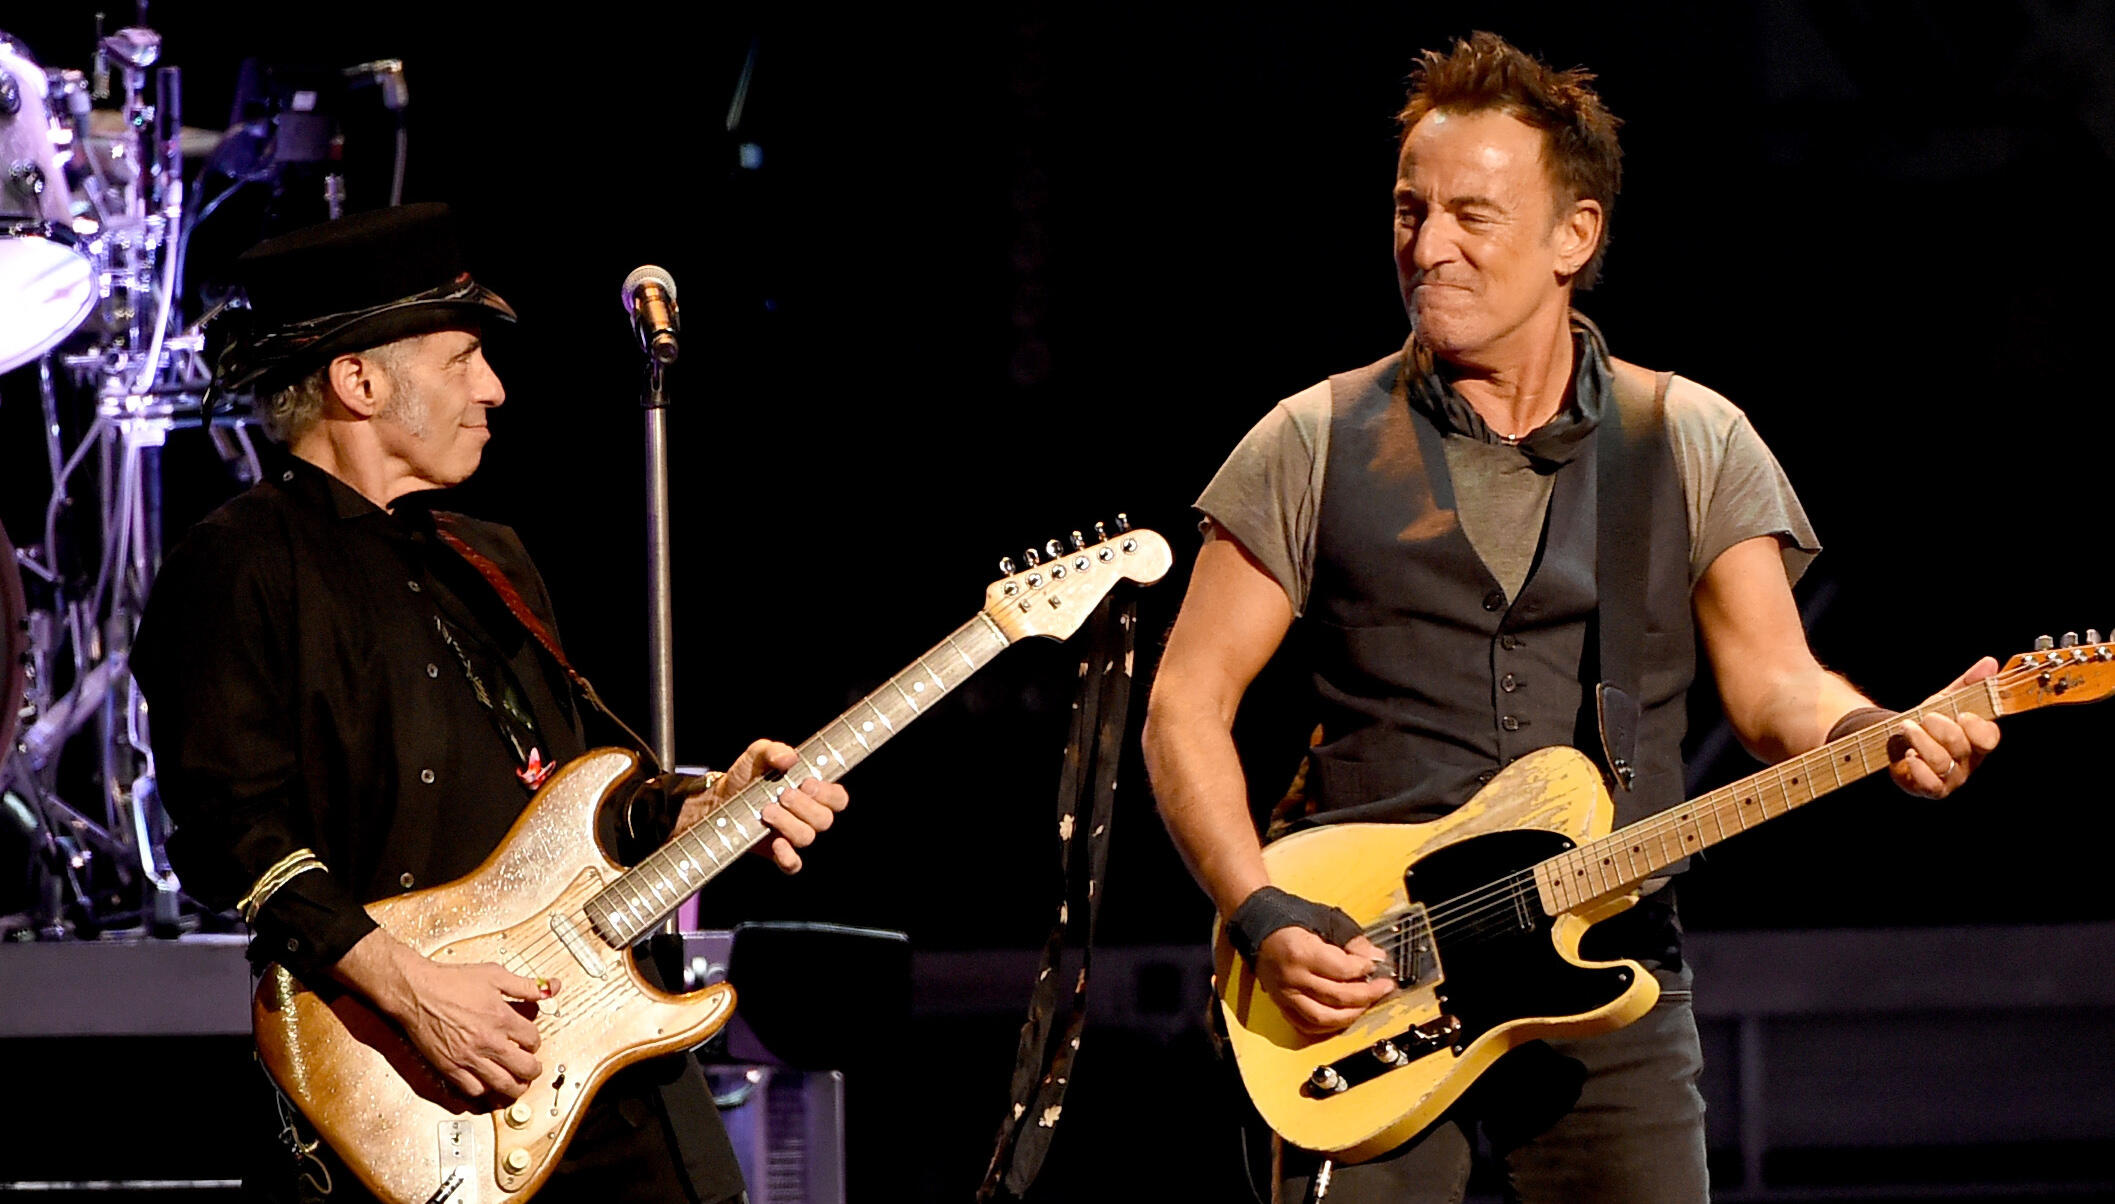 Nils Lofgren Suspects Bruce Springsteen's DWI Arrest Was 'A Vendetta'